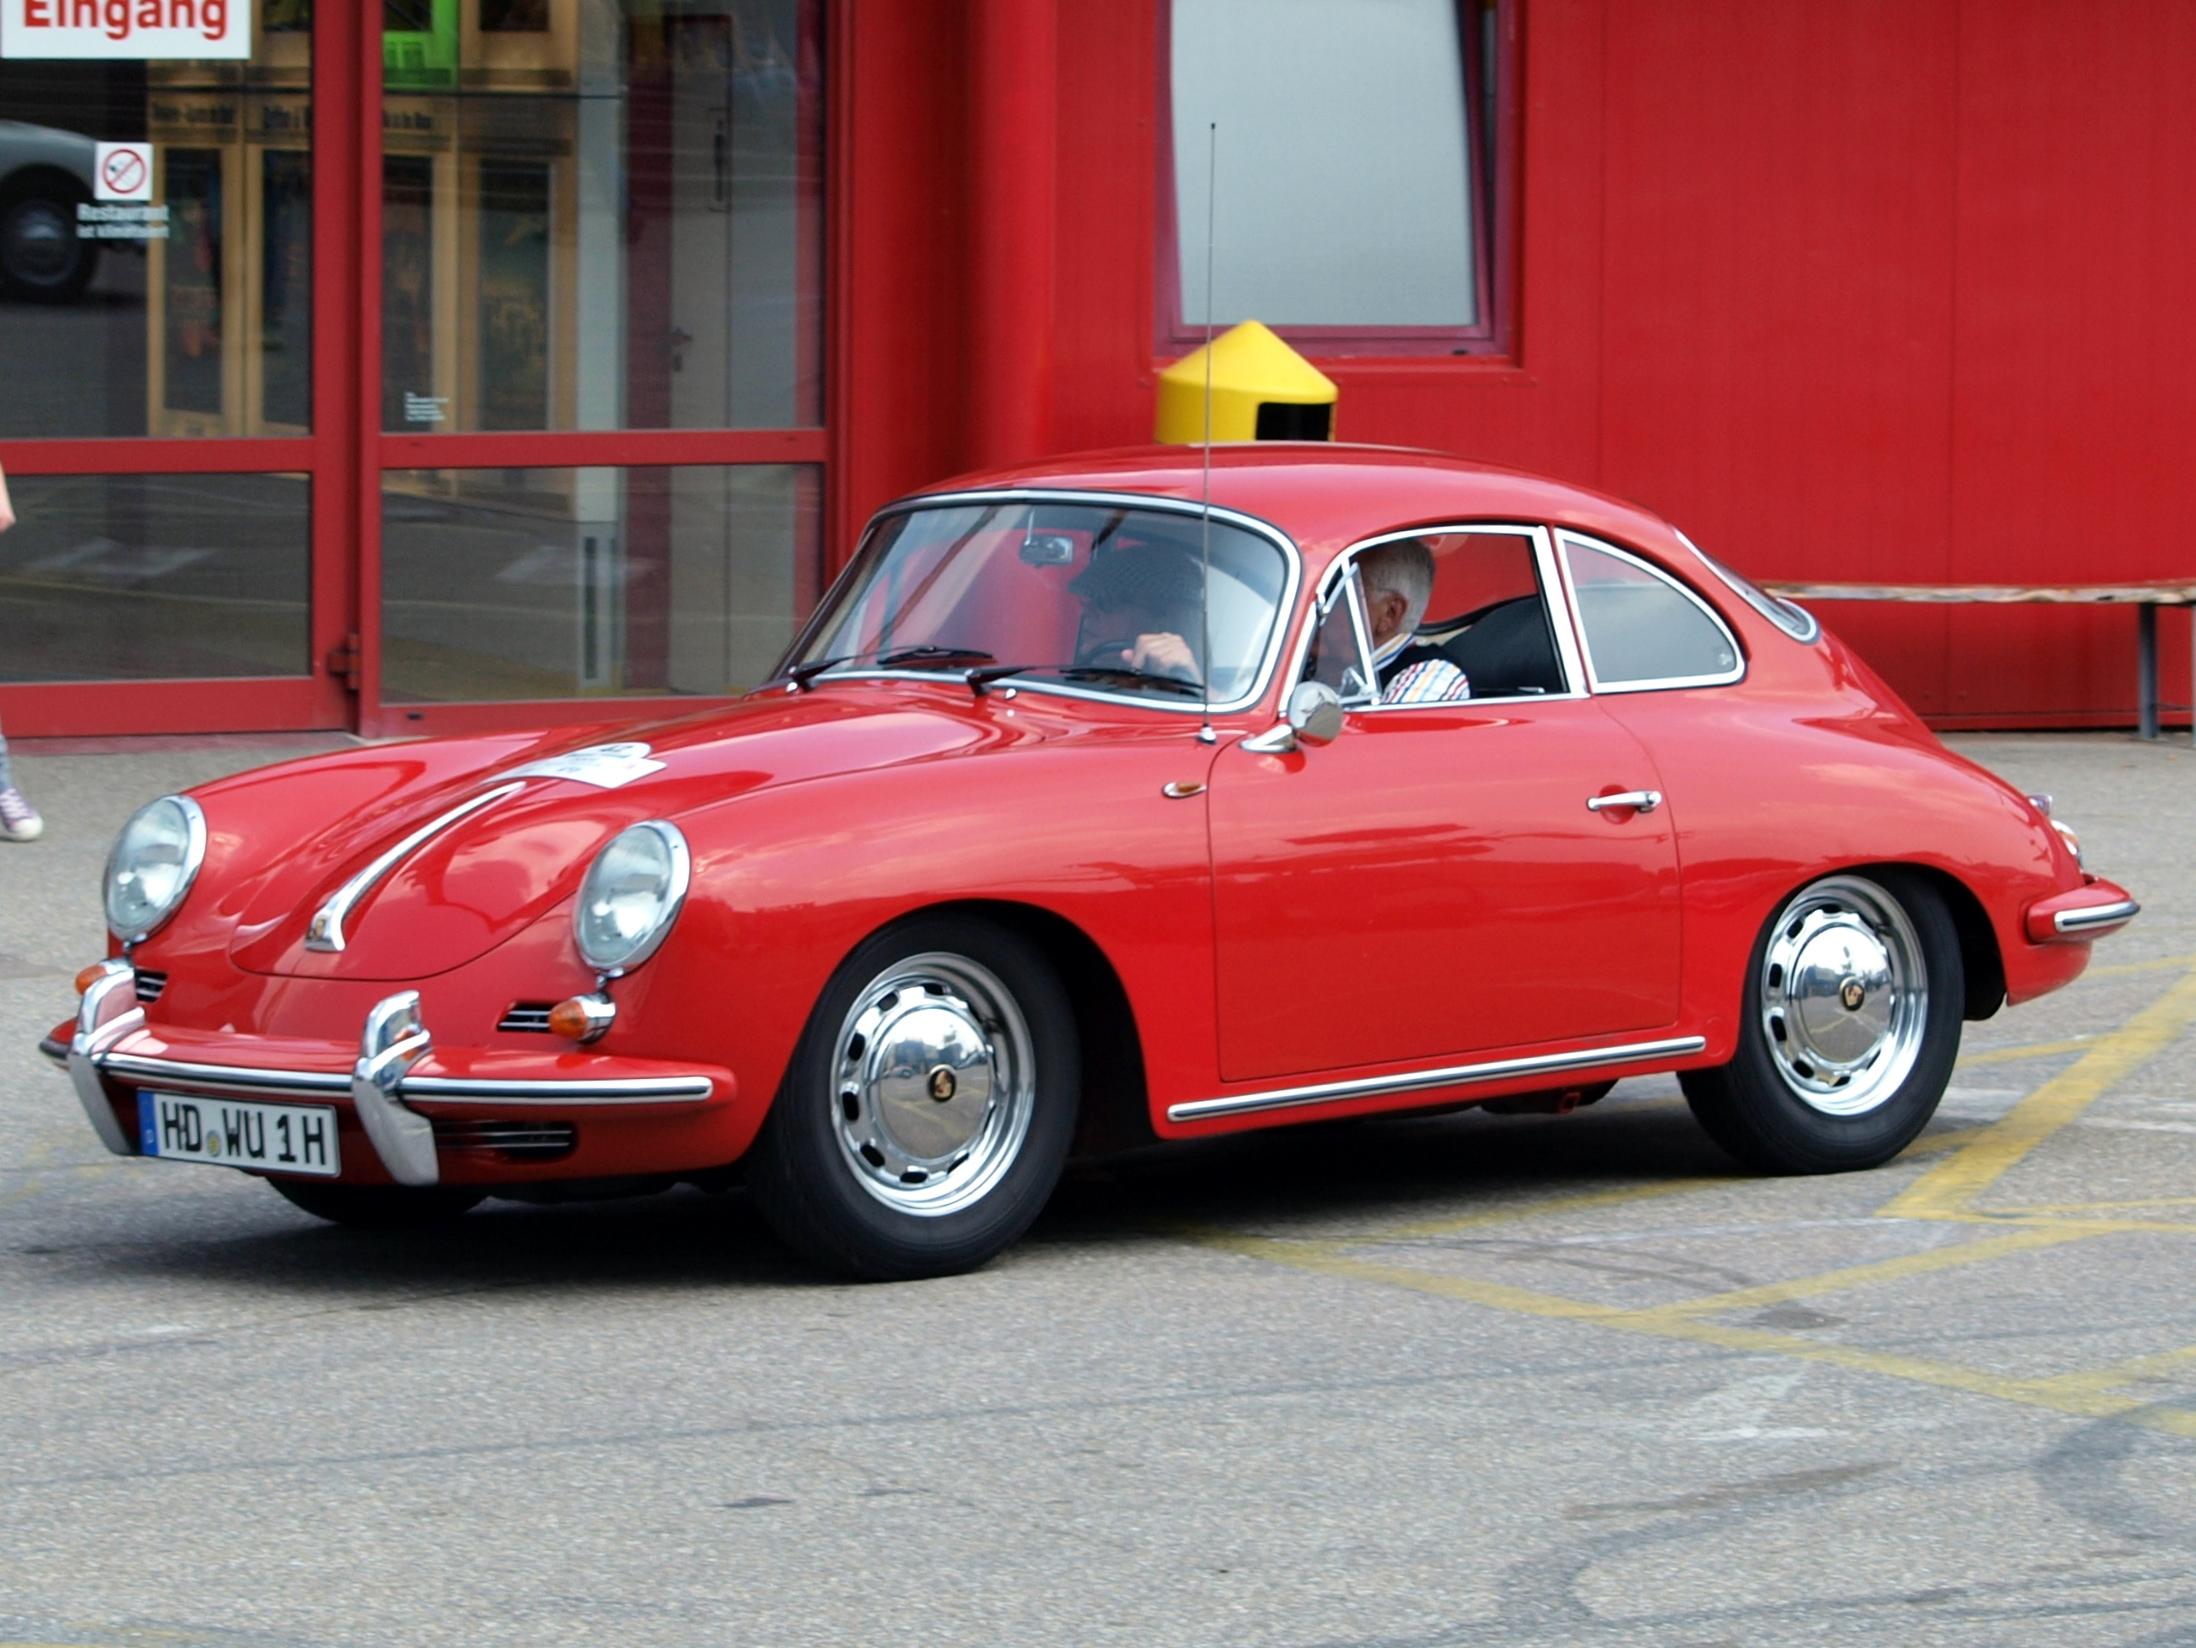 Porsche 356 IV (C) 1963 - 1965 Coupe #6